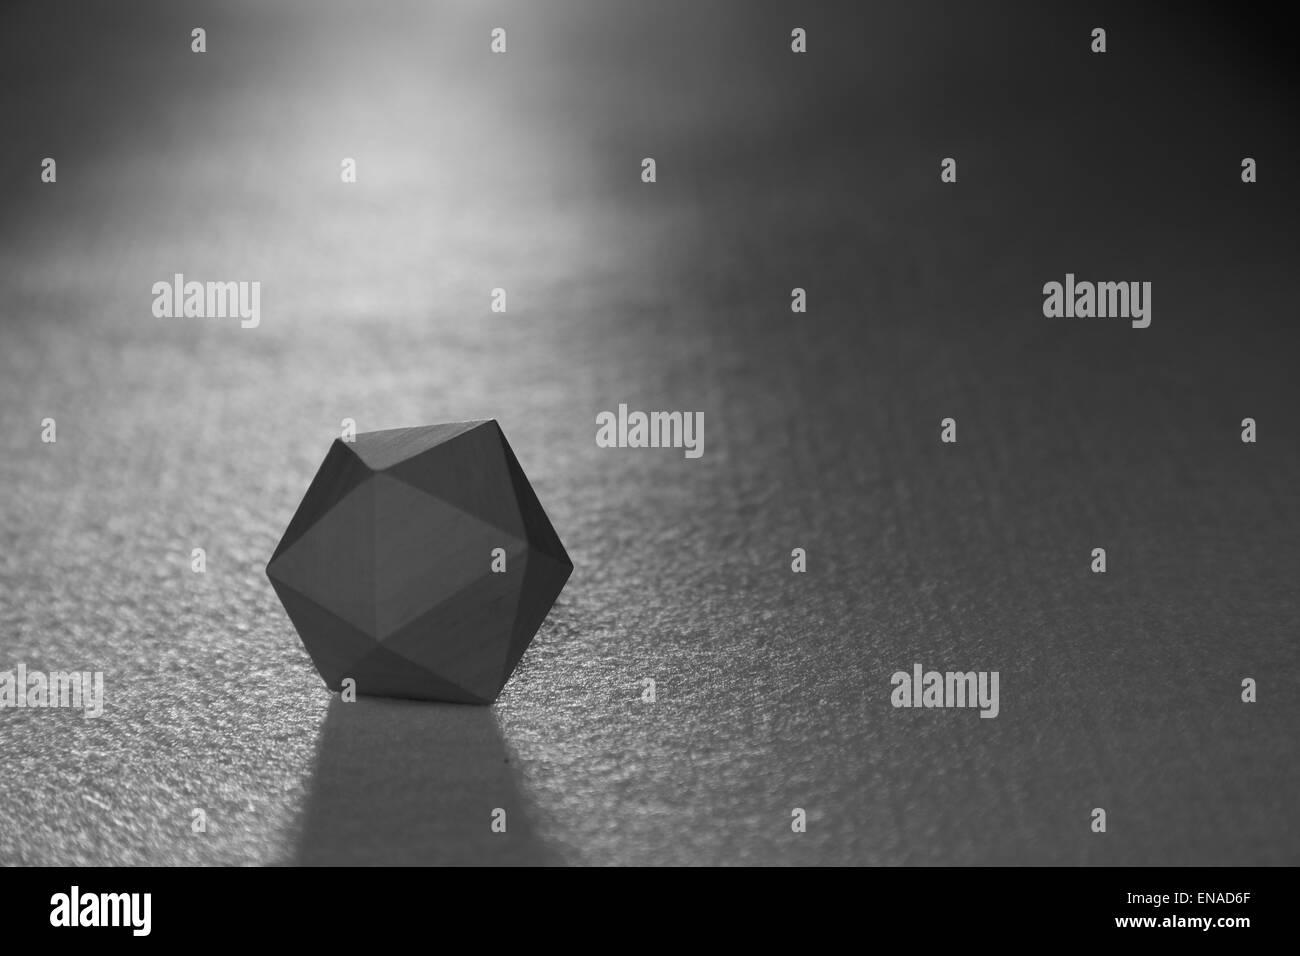 A regular icosahedron - a twenty sided solid figure - one of